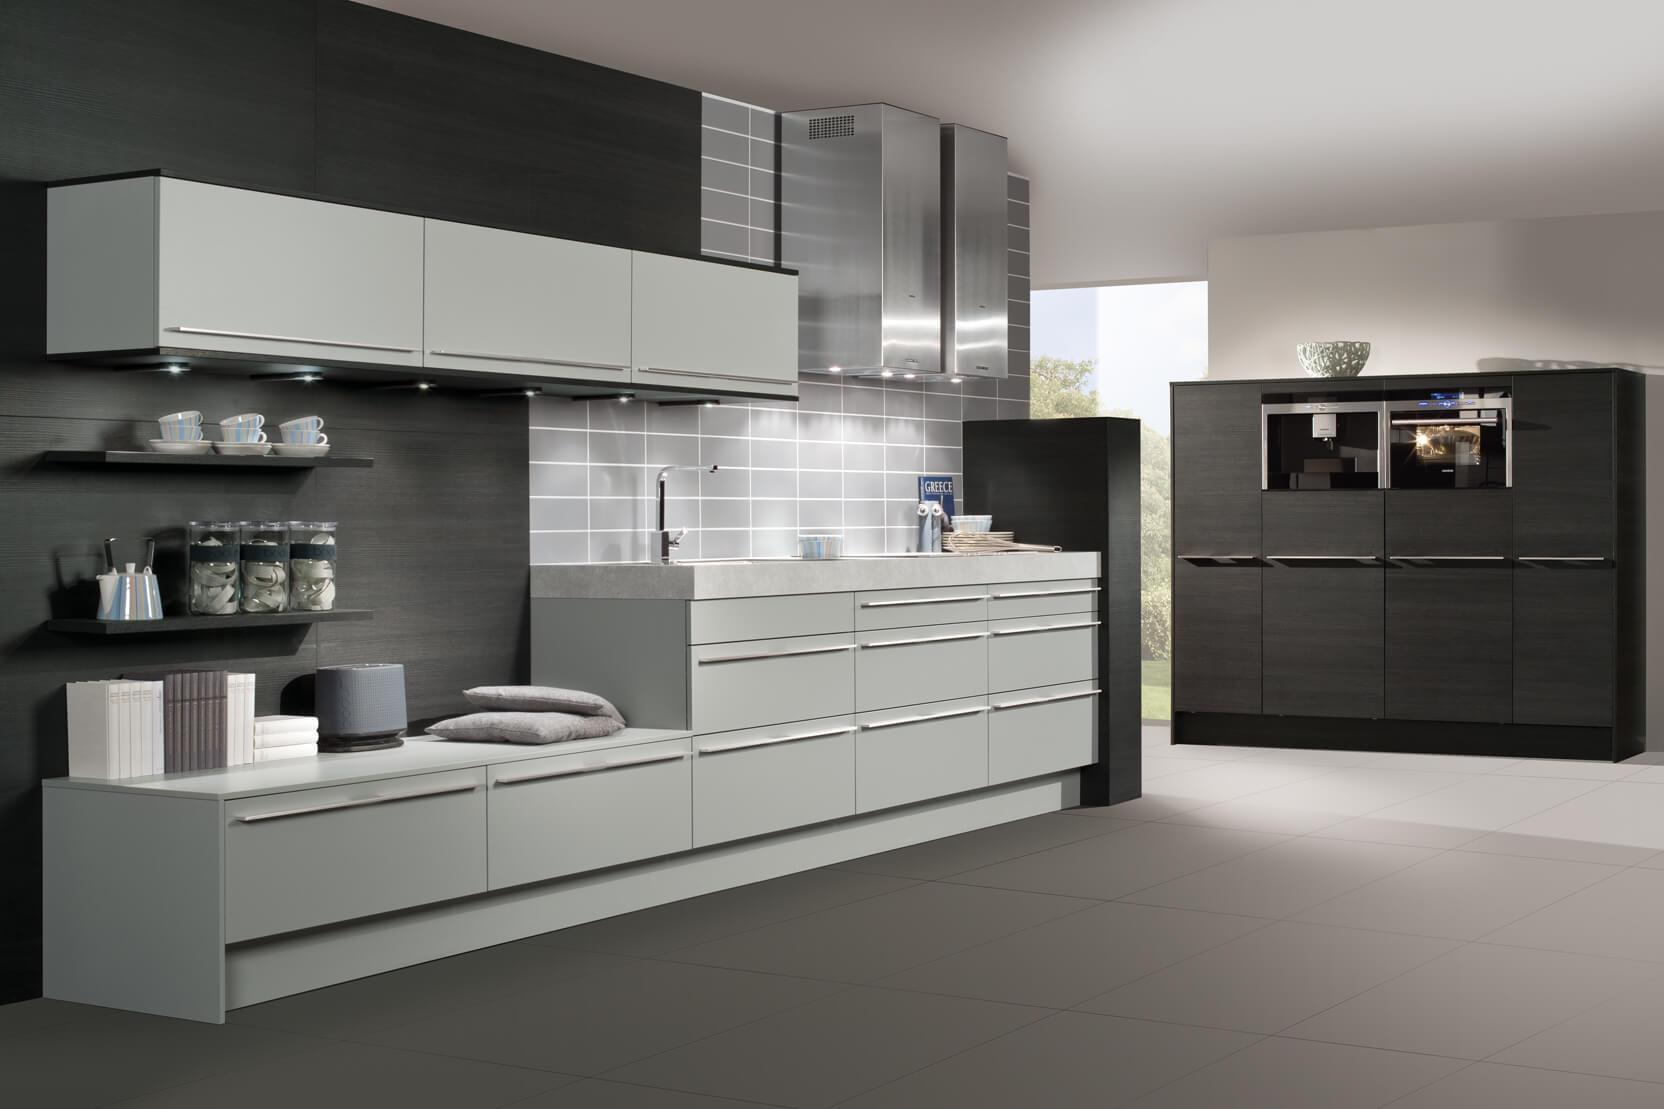 Modern beyaz mutfak dolab dizayni en son dekorasyon modelleri - Modern Beyaz Mutfak Dolab Dizayni En Son Dekorasyon Modelleri 41